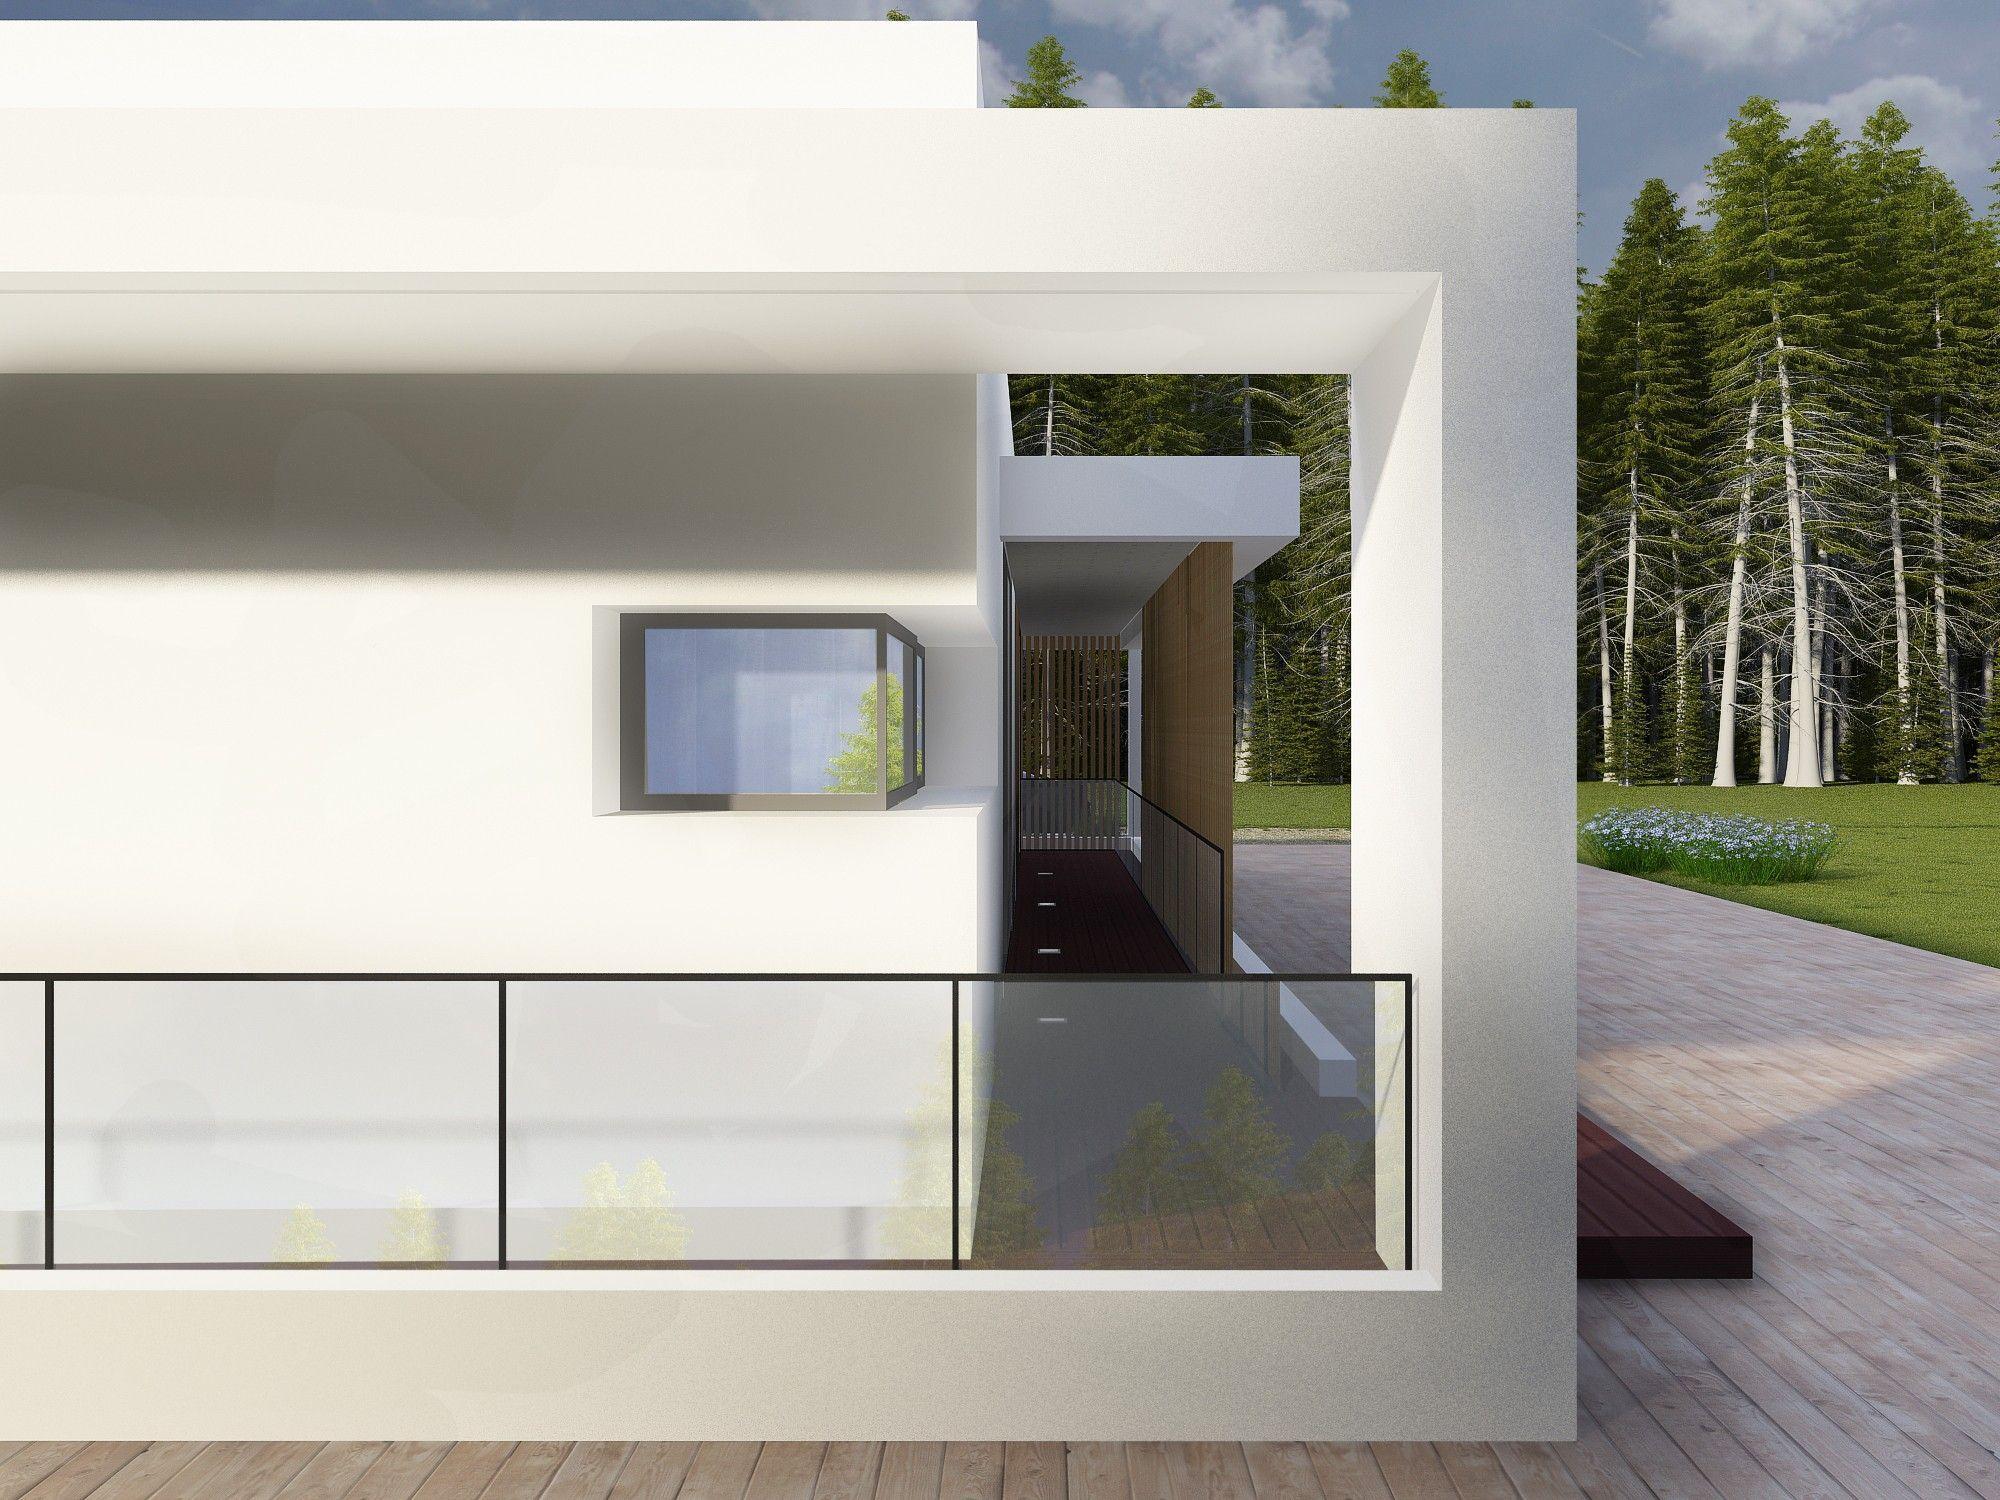 Архитектурный проект дома в стиле конструктивизма